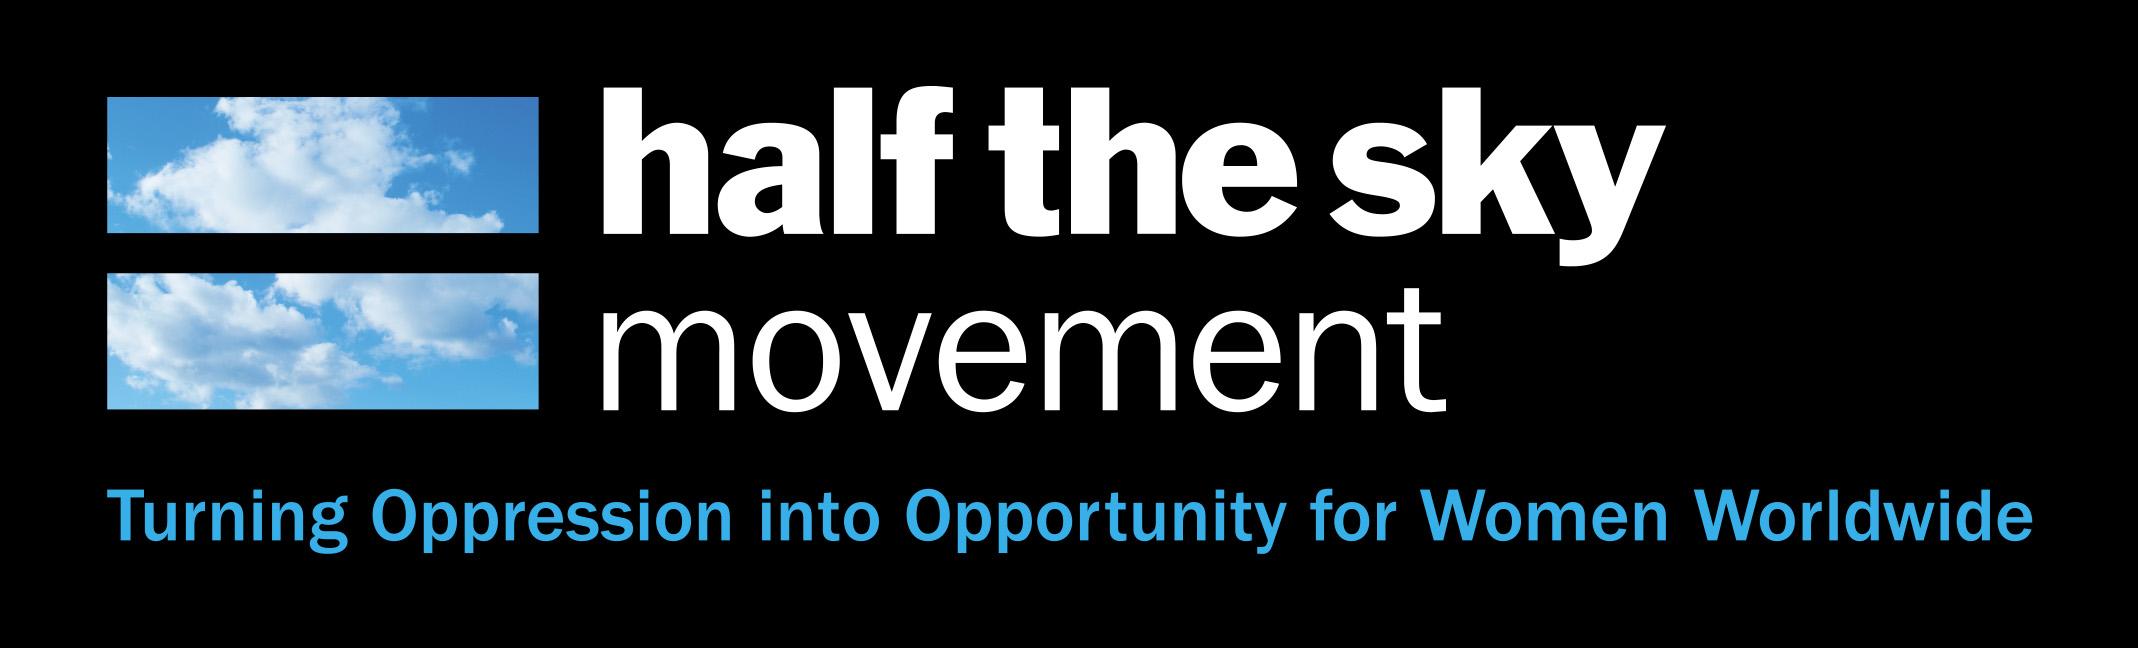 Half the Sky Movement logo